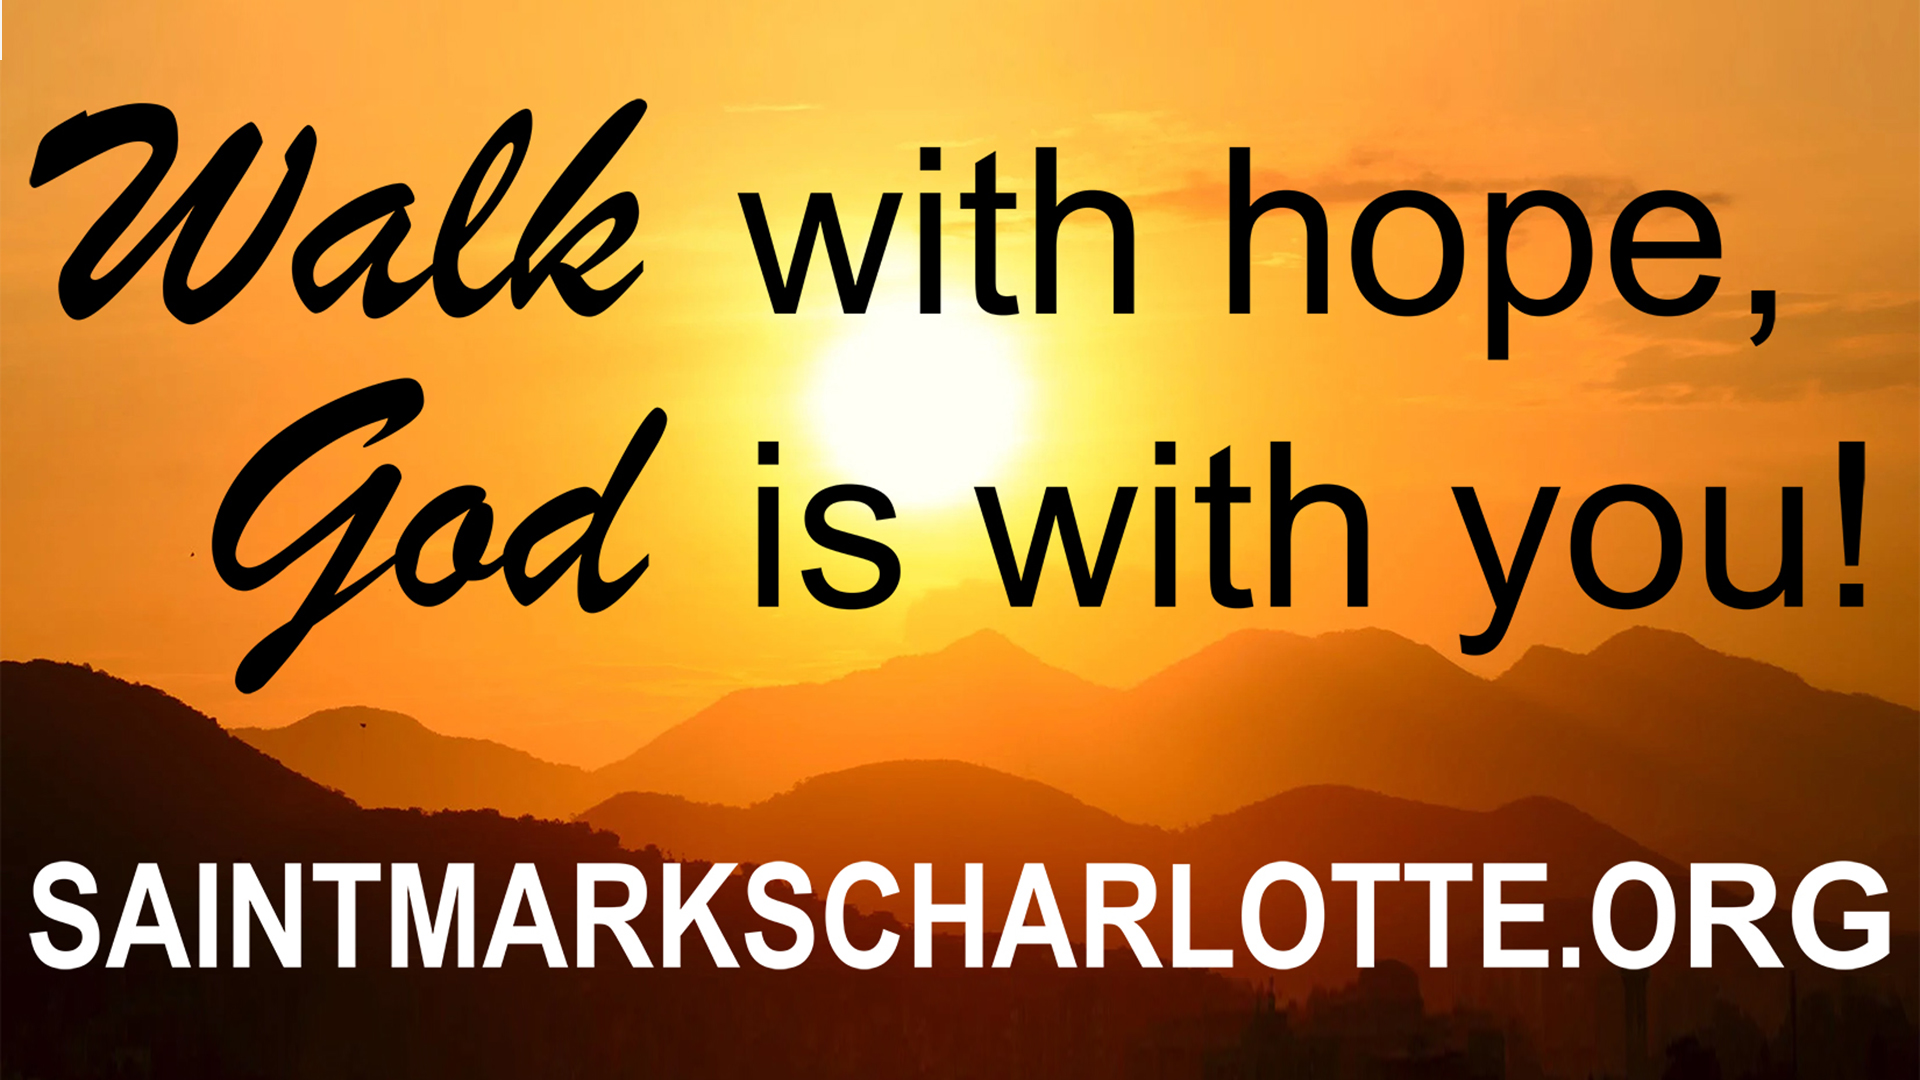 Walk with Hope